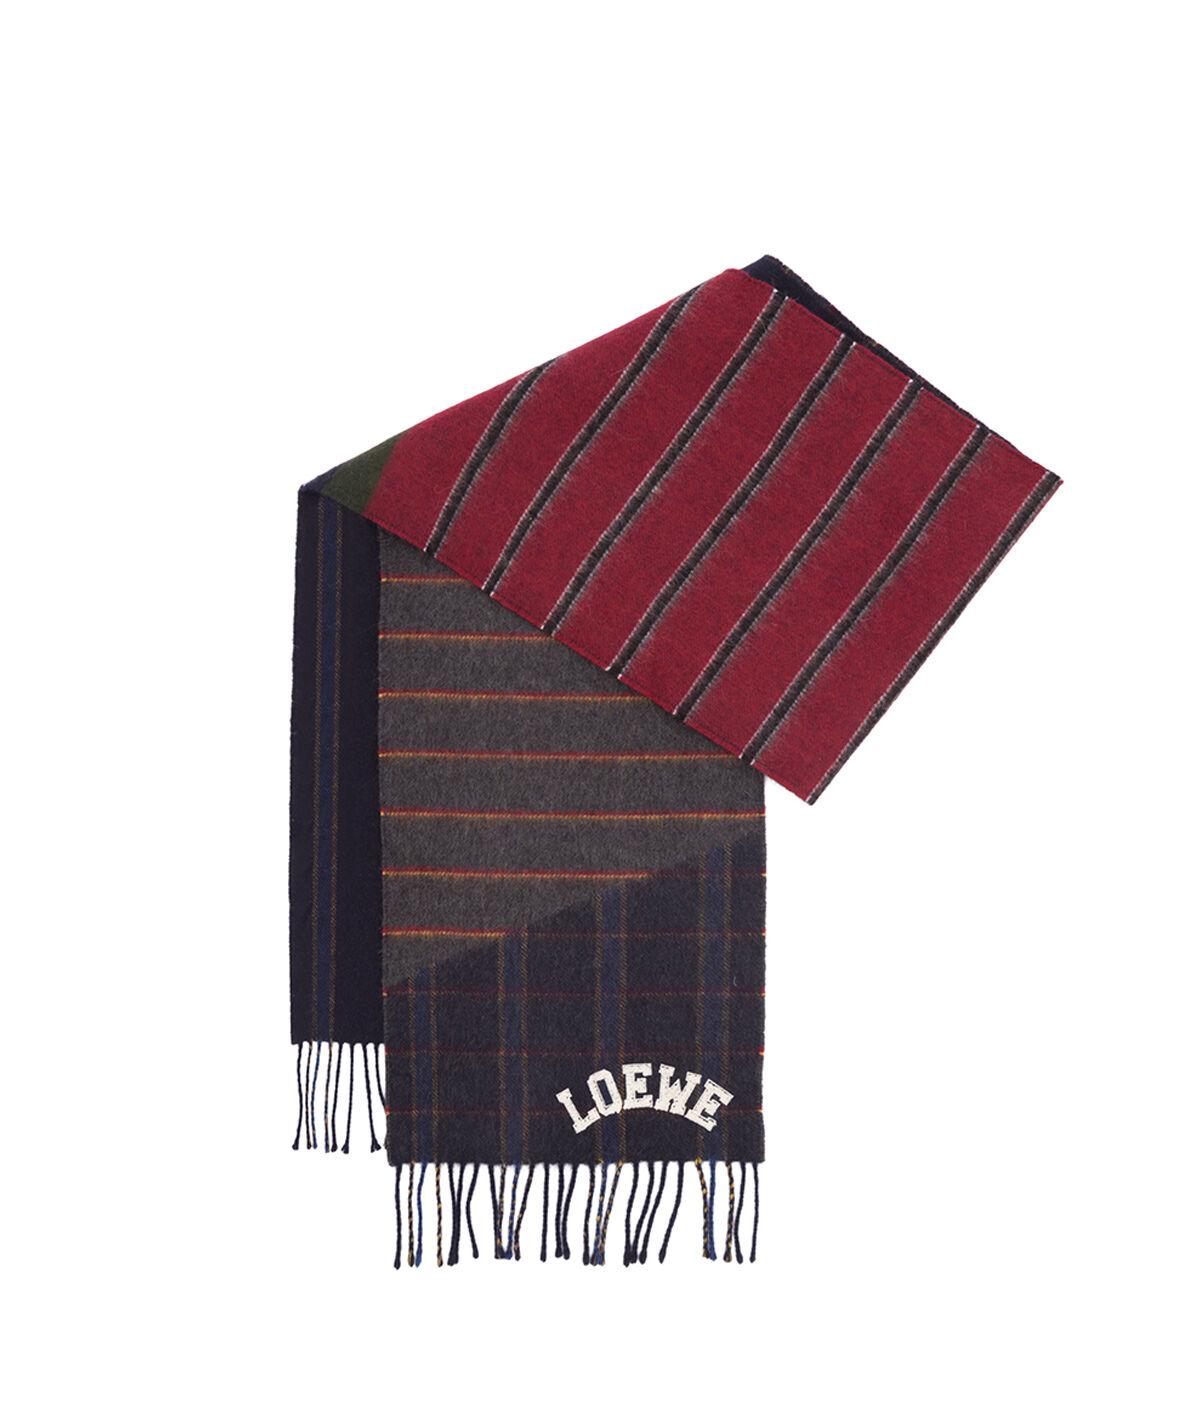 LOEWE 30X180 Scarf Varsity Stripes Azul Oscuro/Rojo Oscuro/Oro all